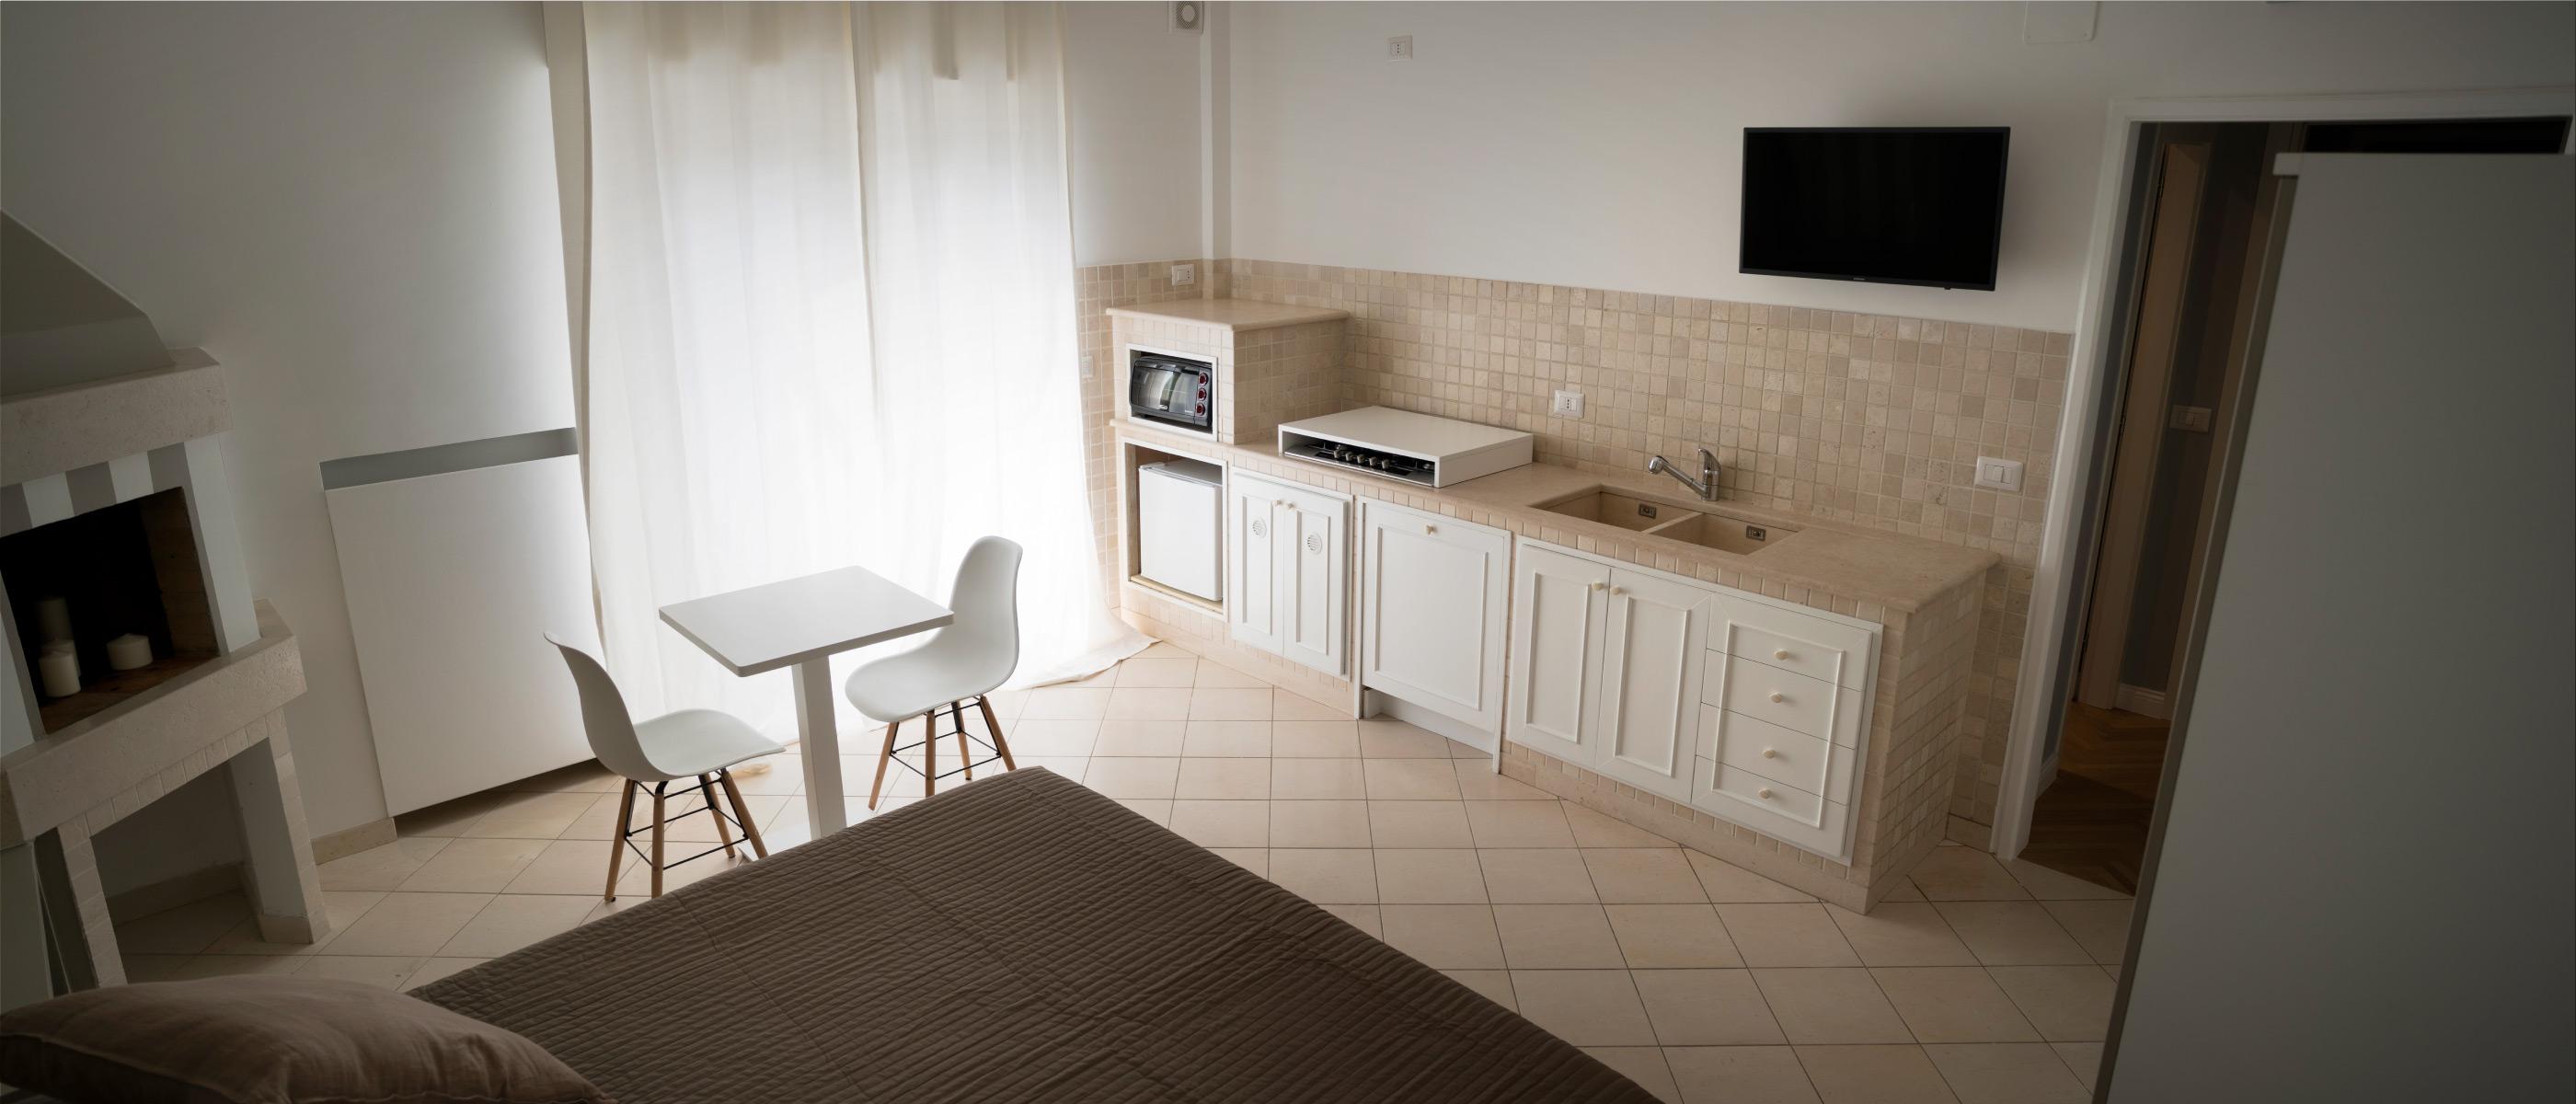 Mini Apartment Room56 Bed And Breakfast Bari Room In Bari